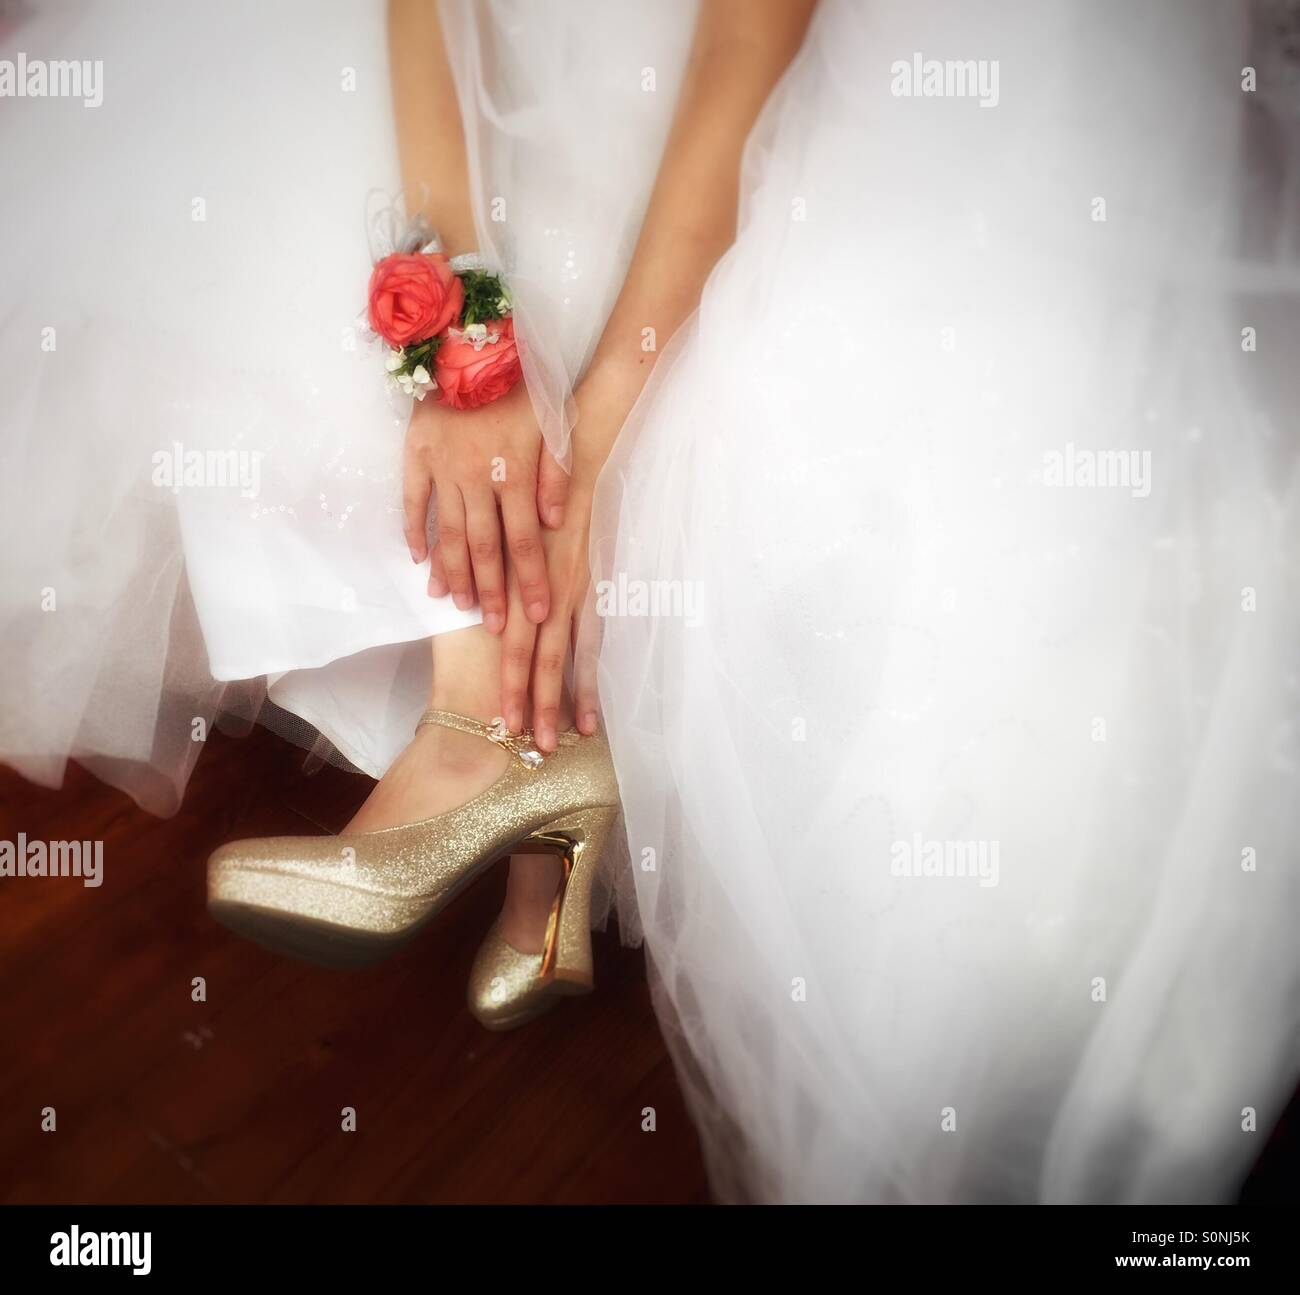 Zapatos de novia boda Imagen De Stock